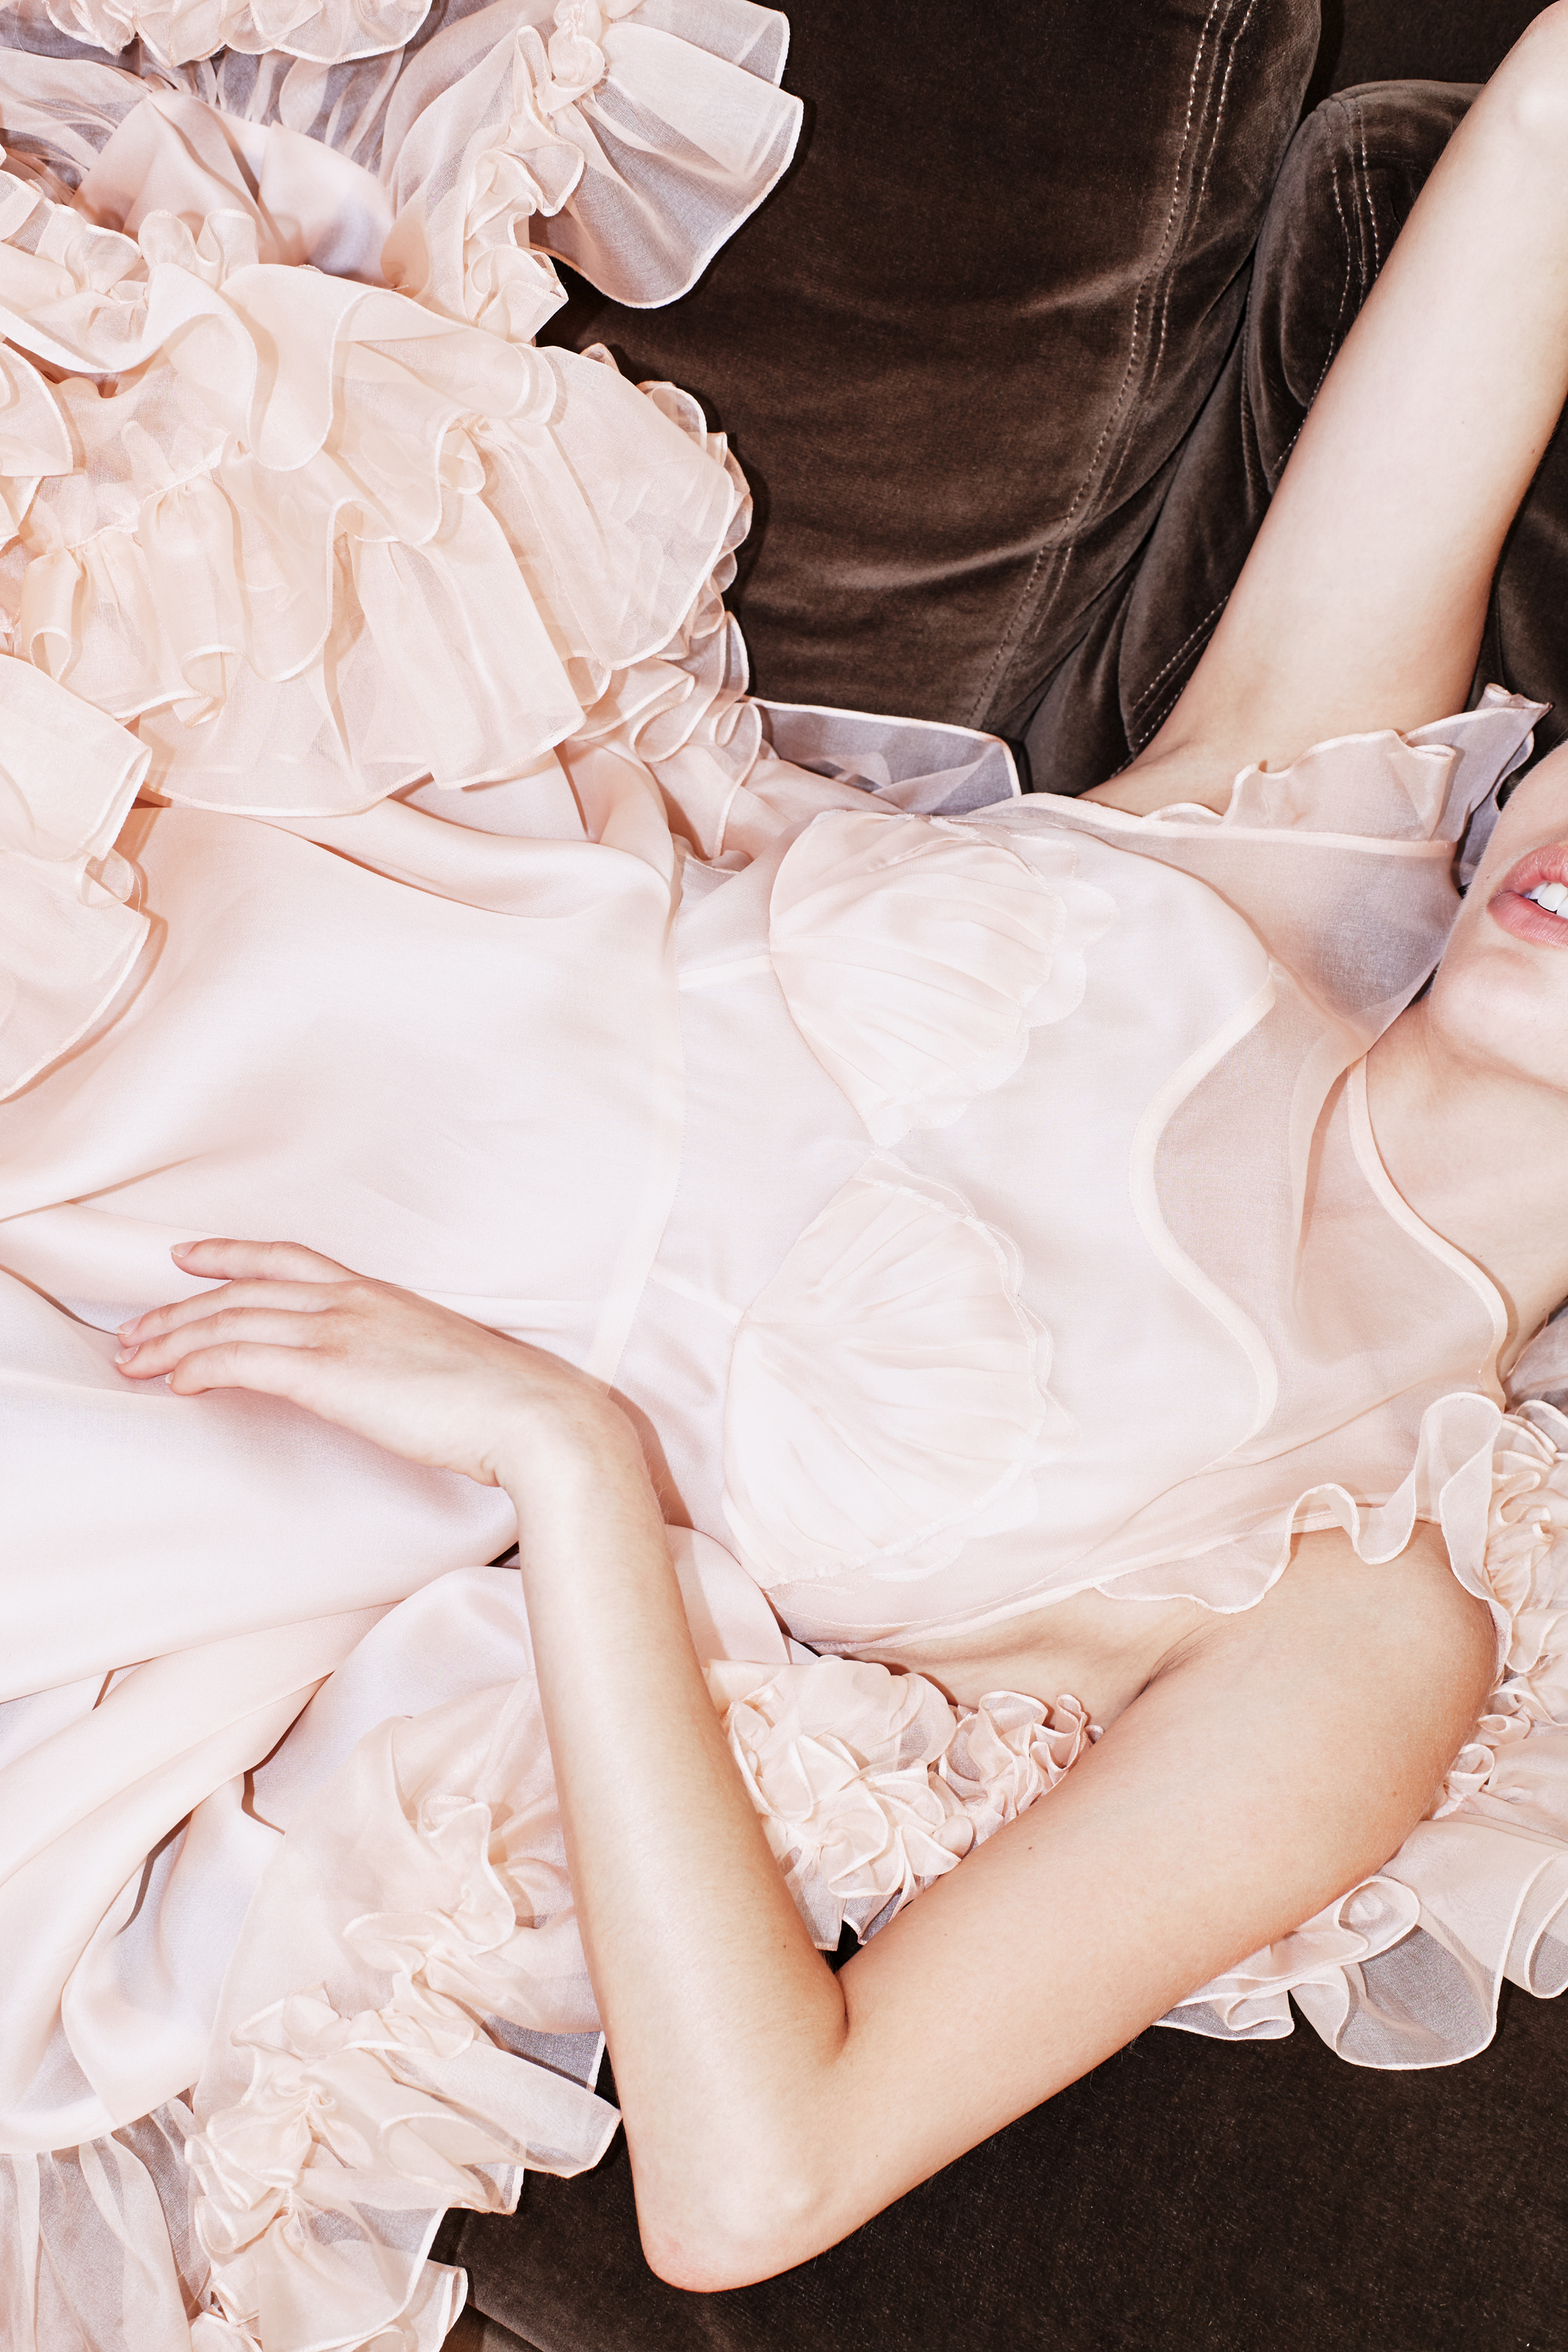 kelsey randall peach pink ballet silk organza mermaid seashell ruffle flounce pleated babydoll dress cute romantic girlie